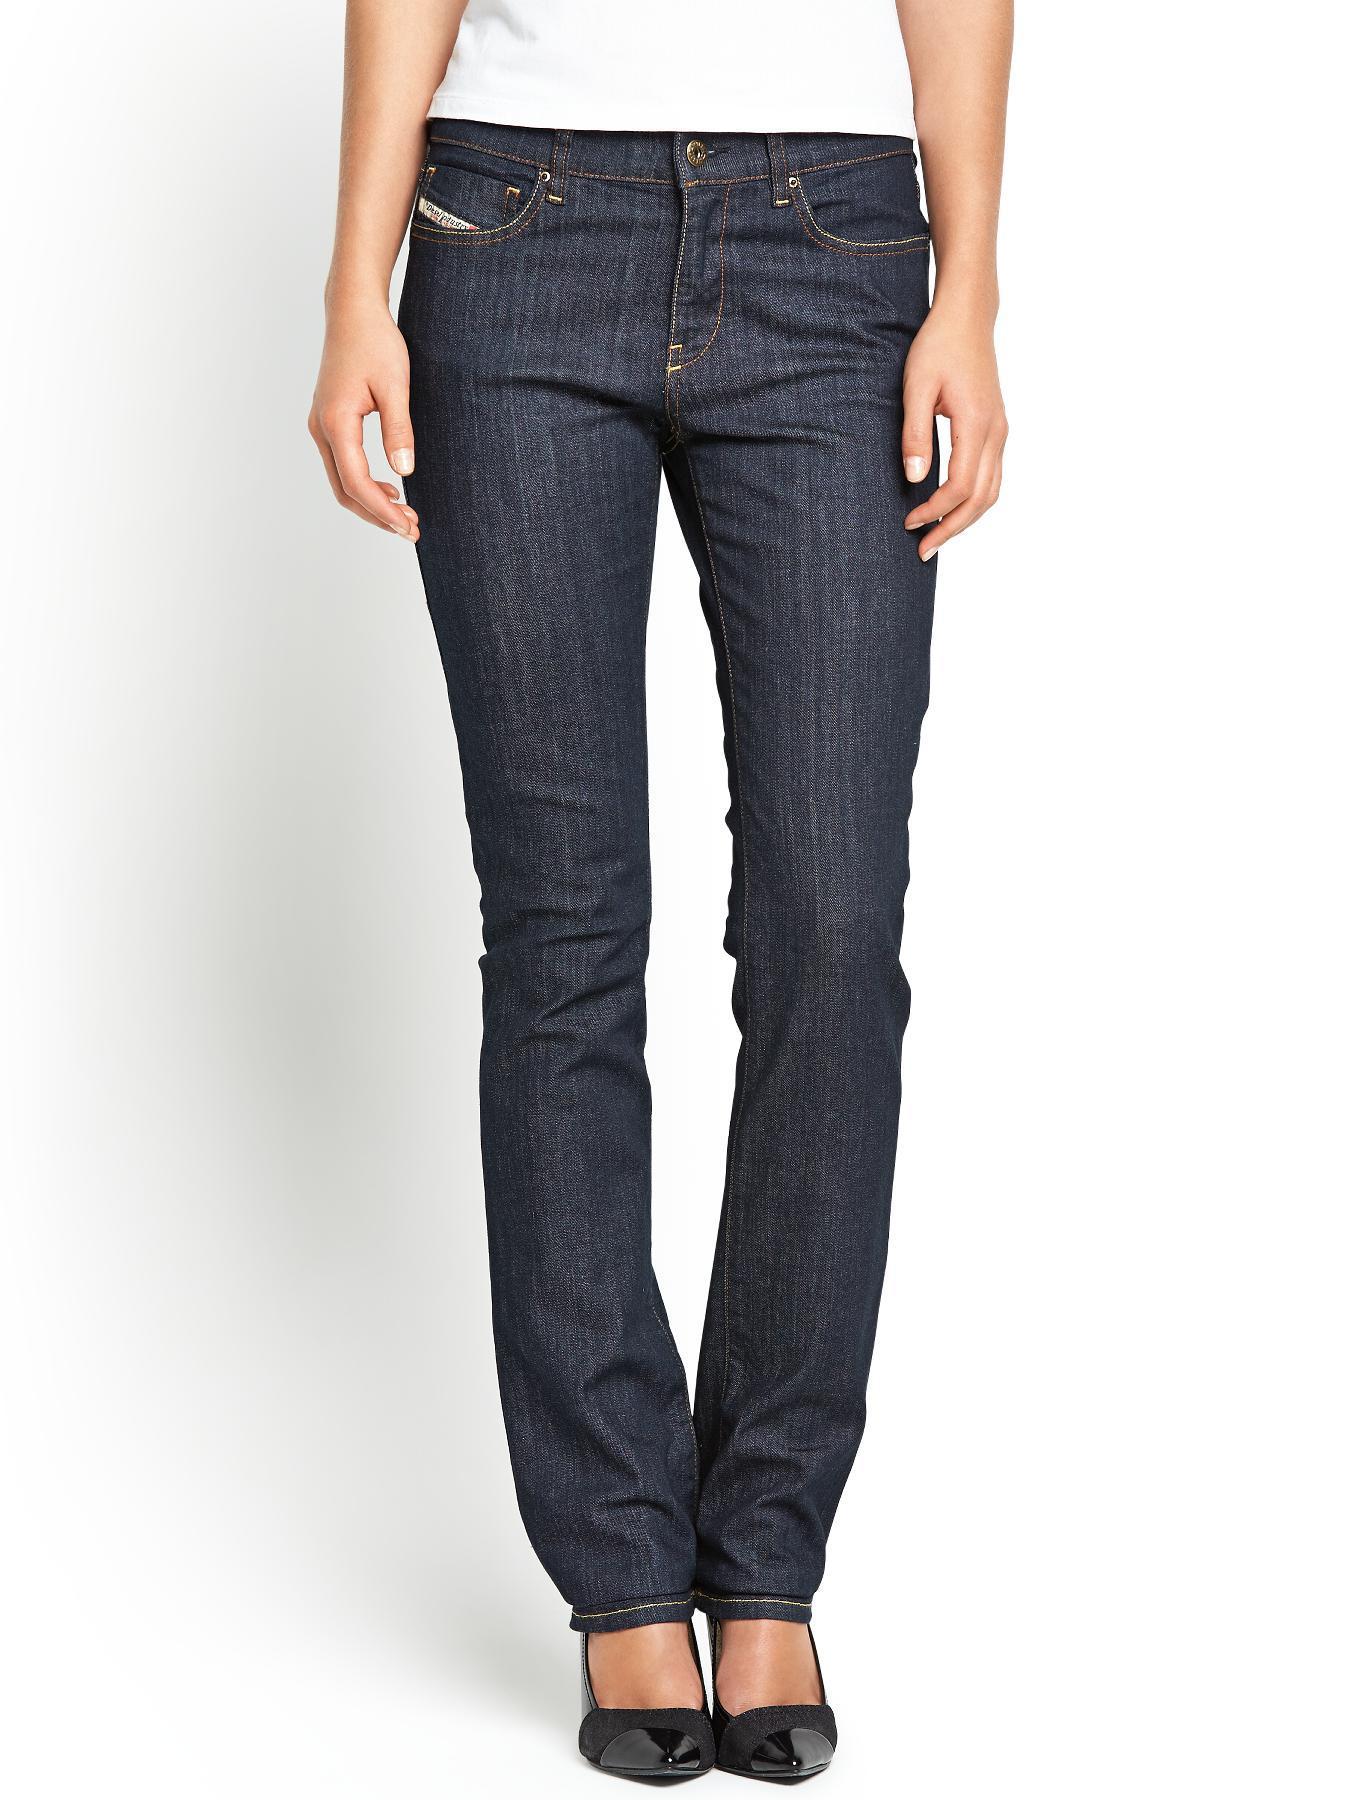 Bootzee Slim Bootcut Jeans - Raw